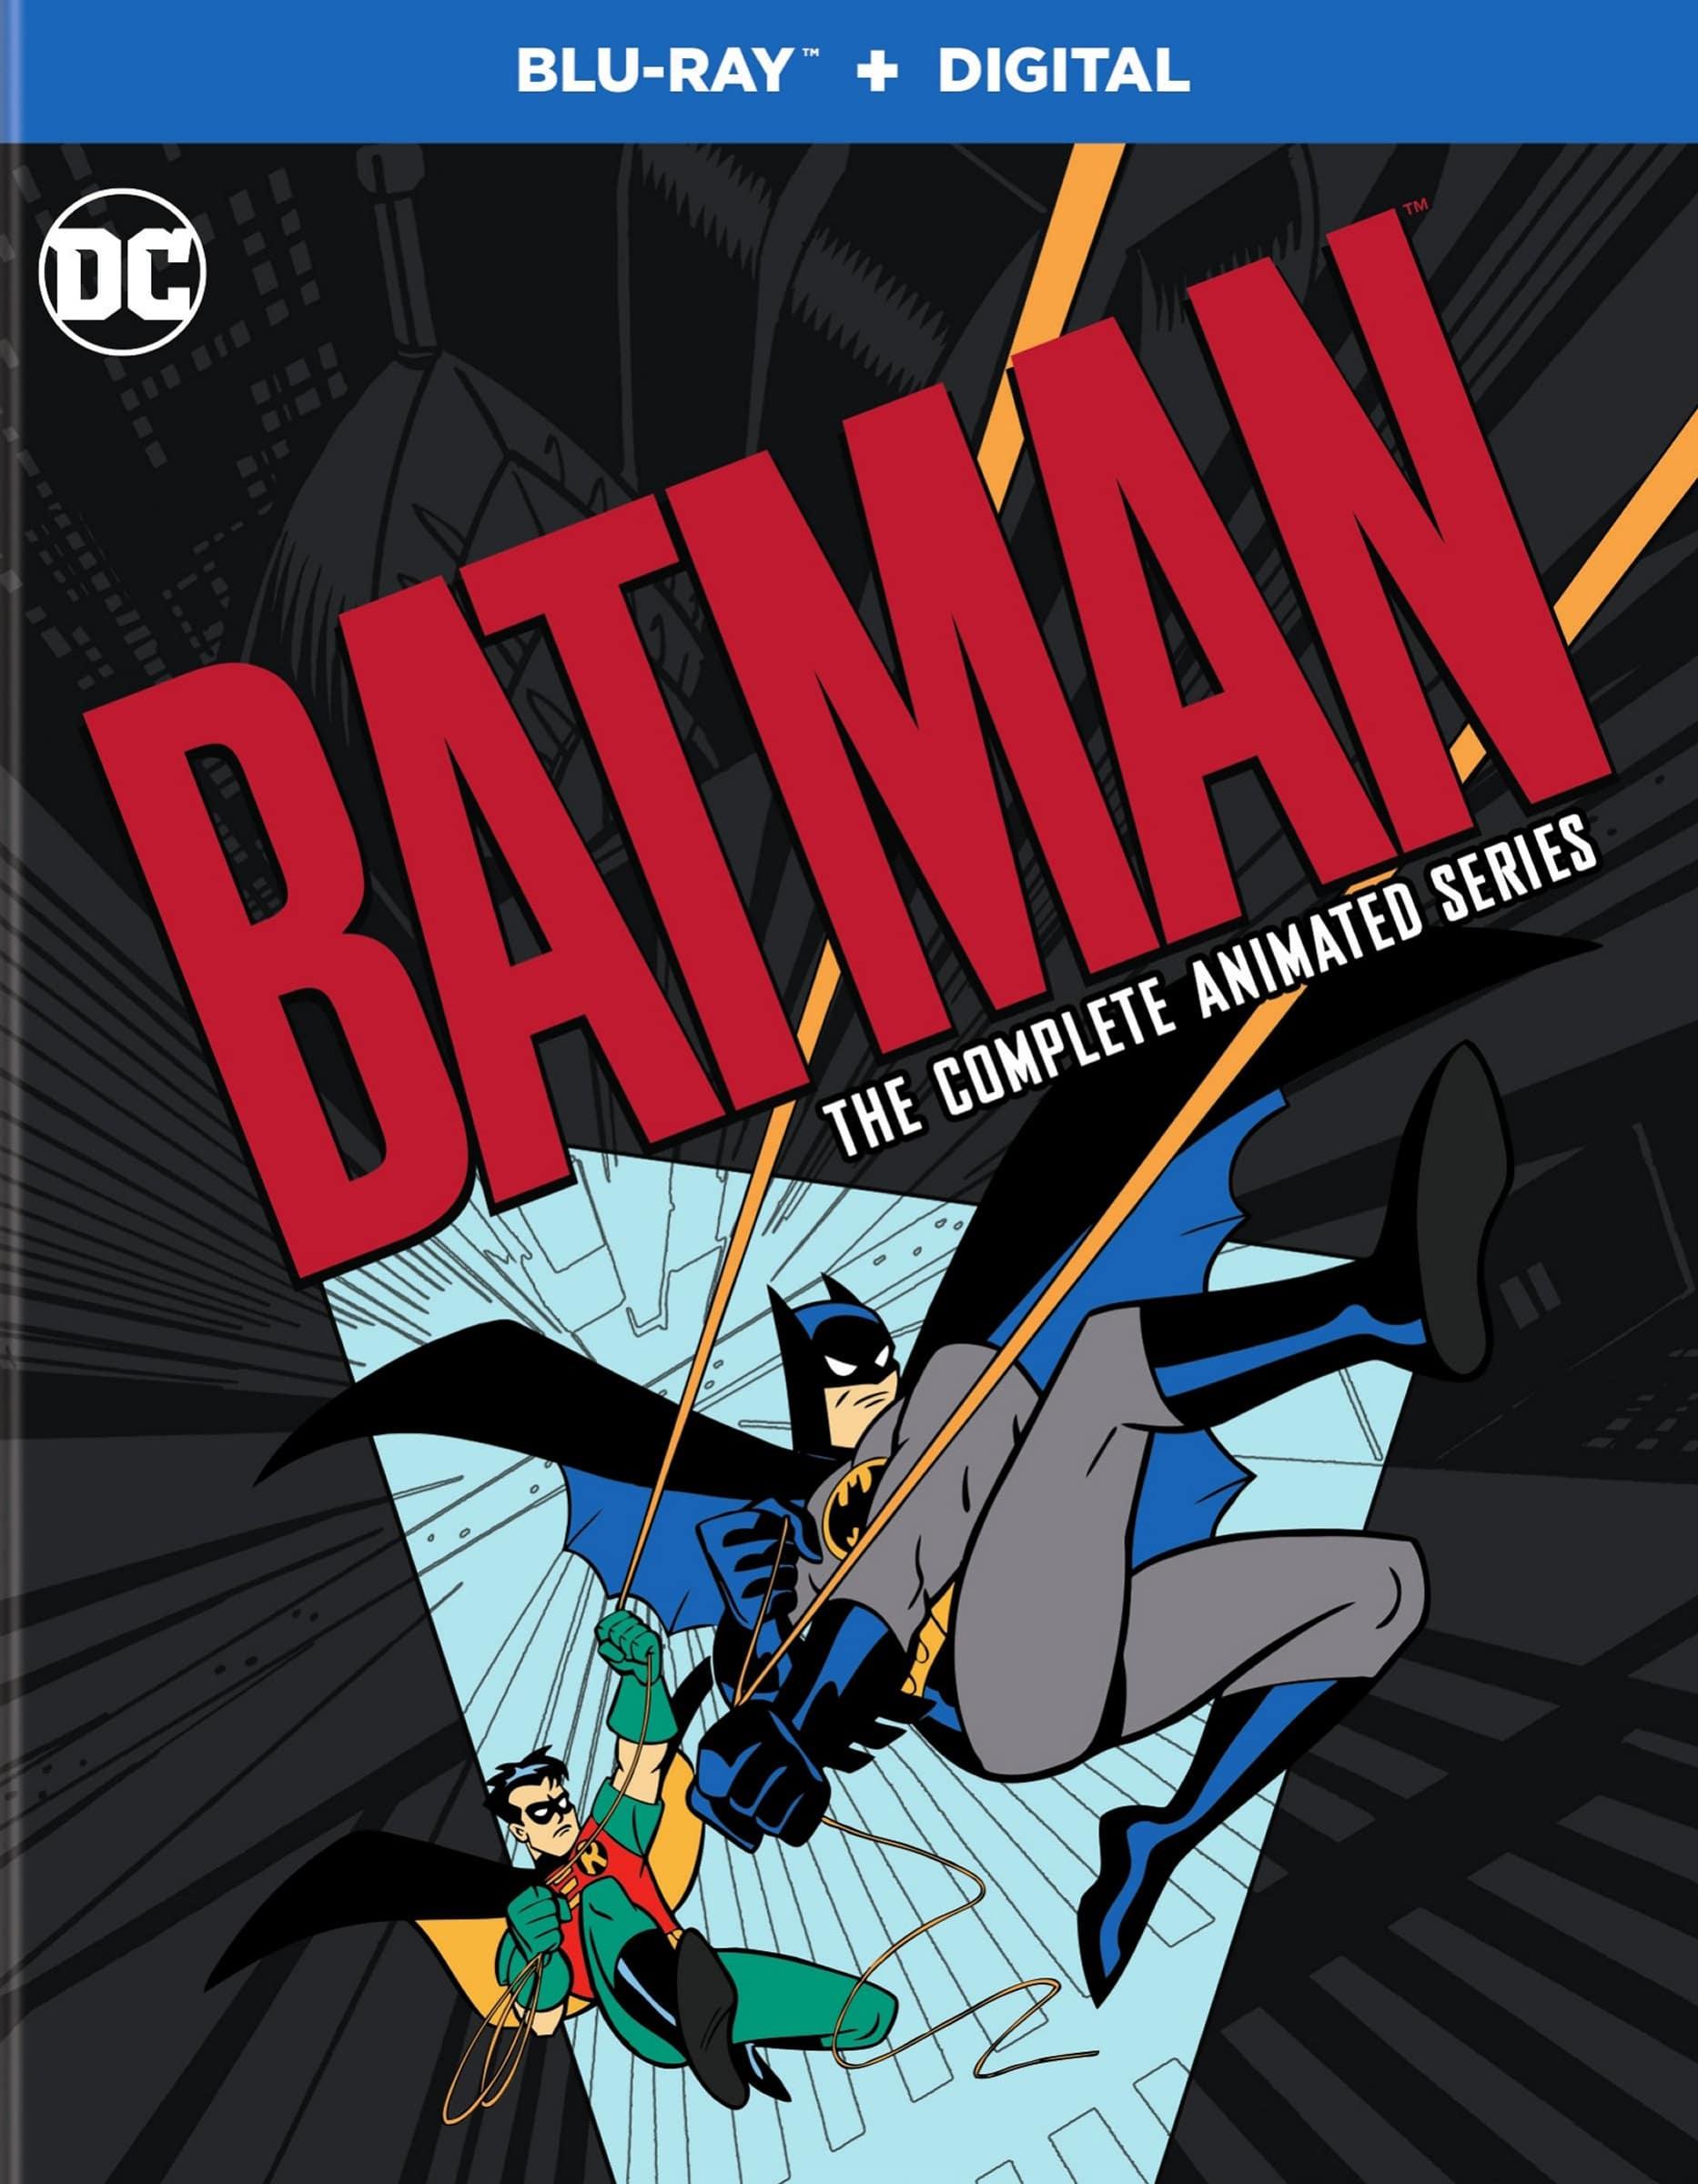 Batman : the animated series